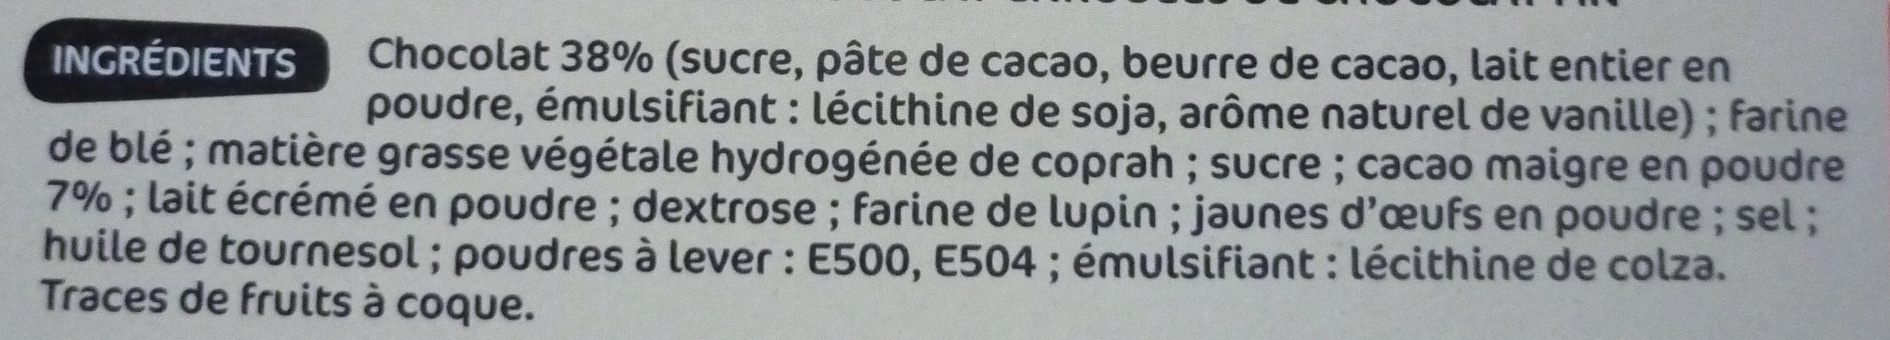 Gaufrettes enrobées chocolat - Ingredients - fr